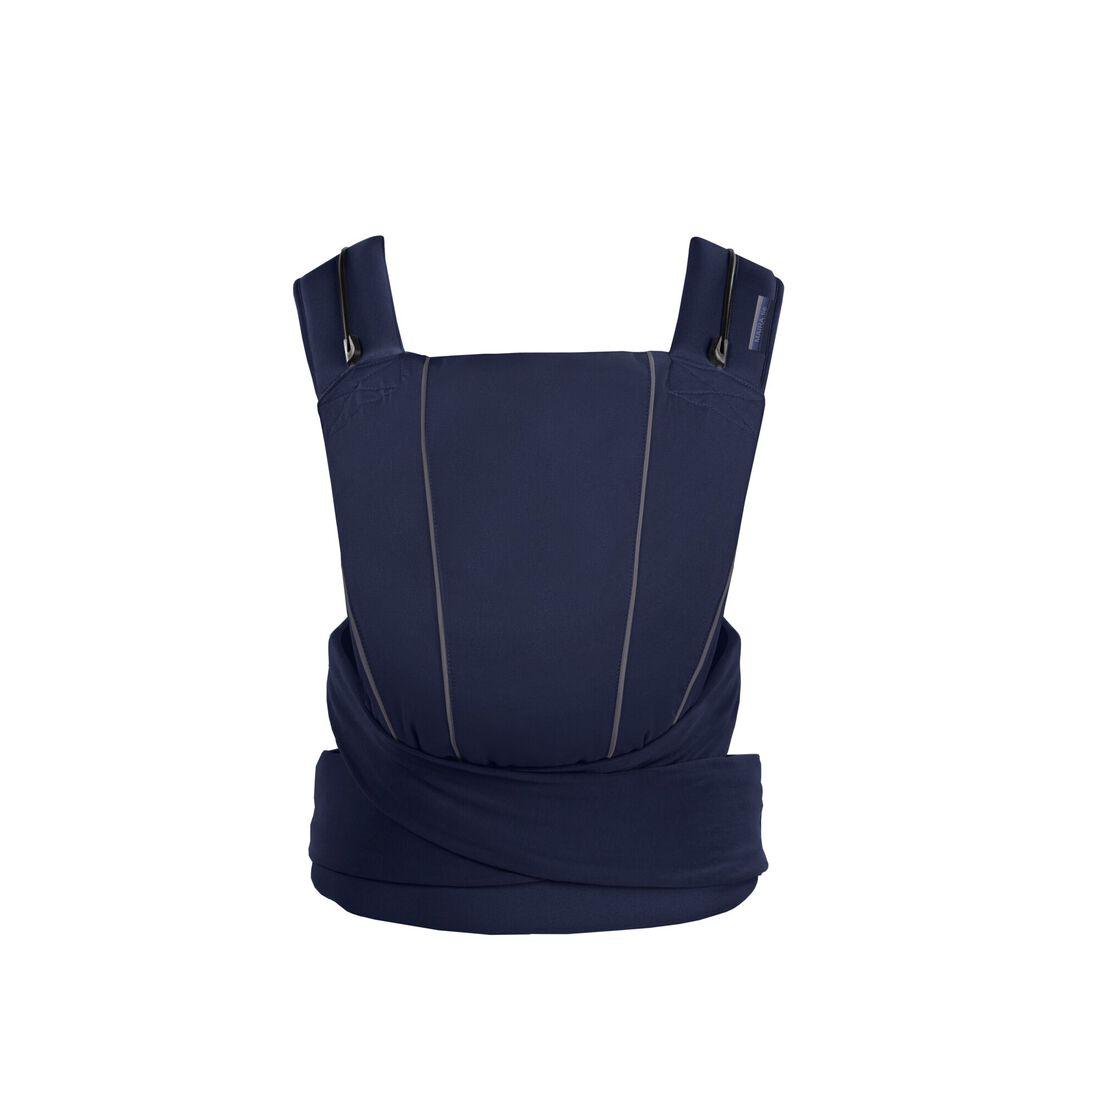 CYBEX Maira Tie - Denim Blue in Denim Blue large image number 1